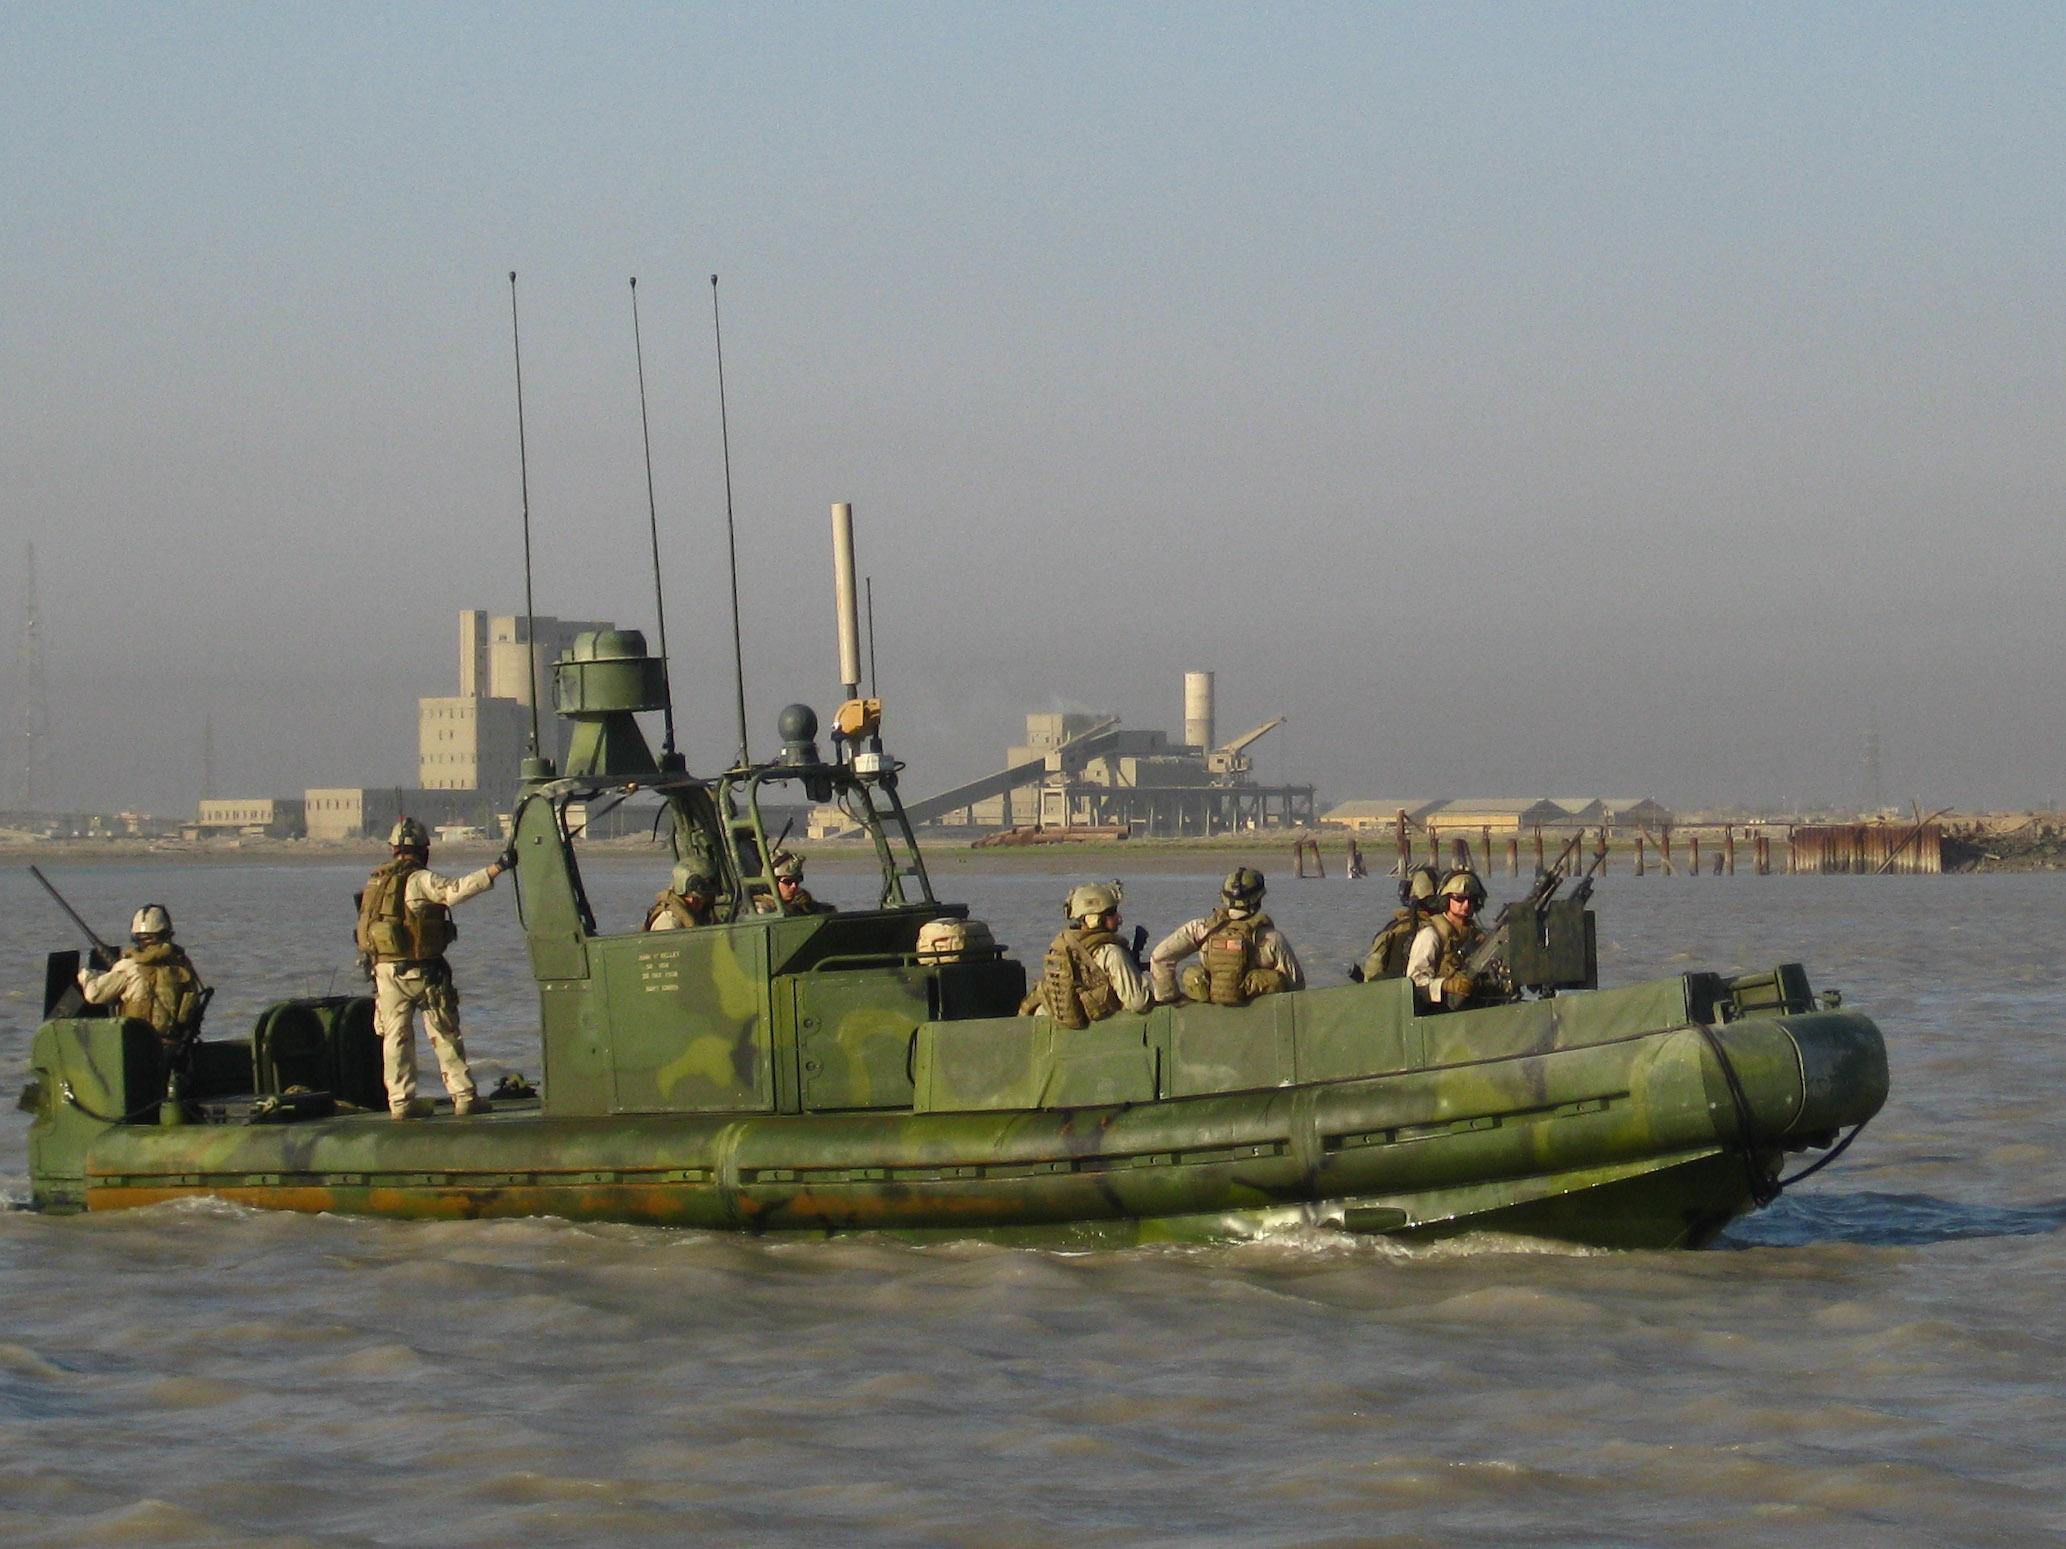 Military River Patrol Boats